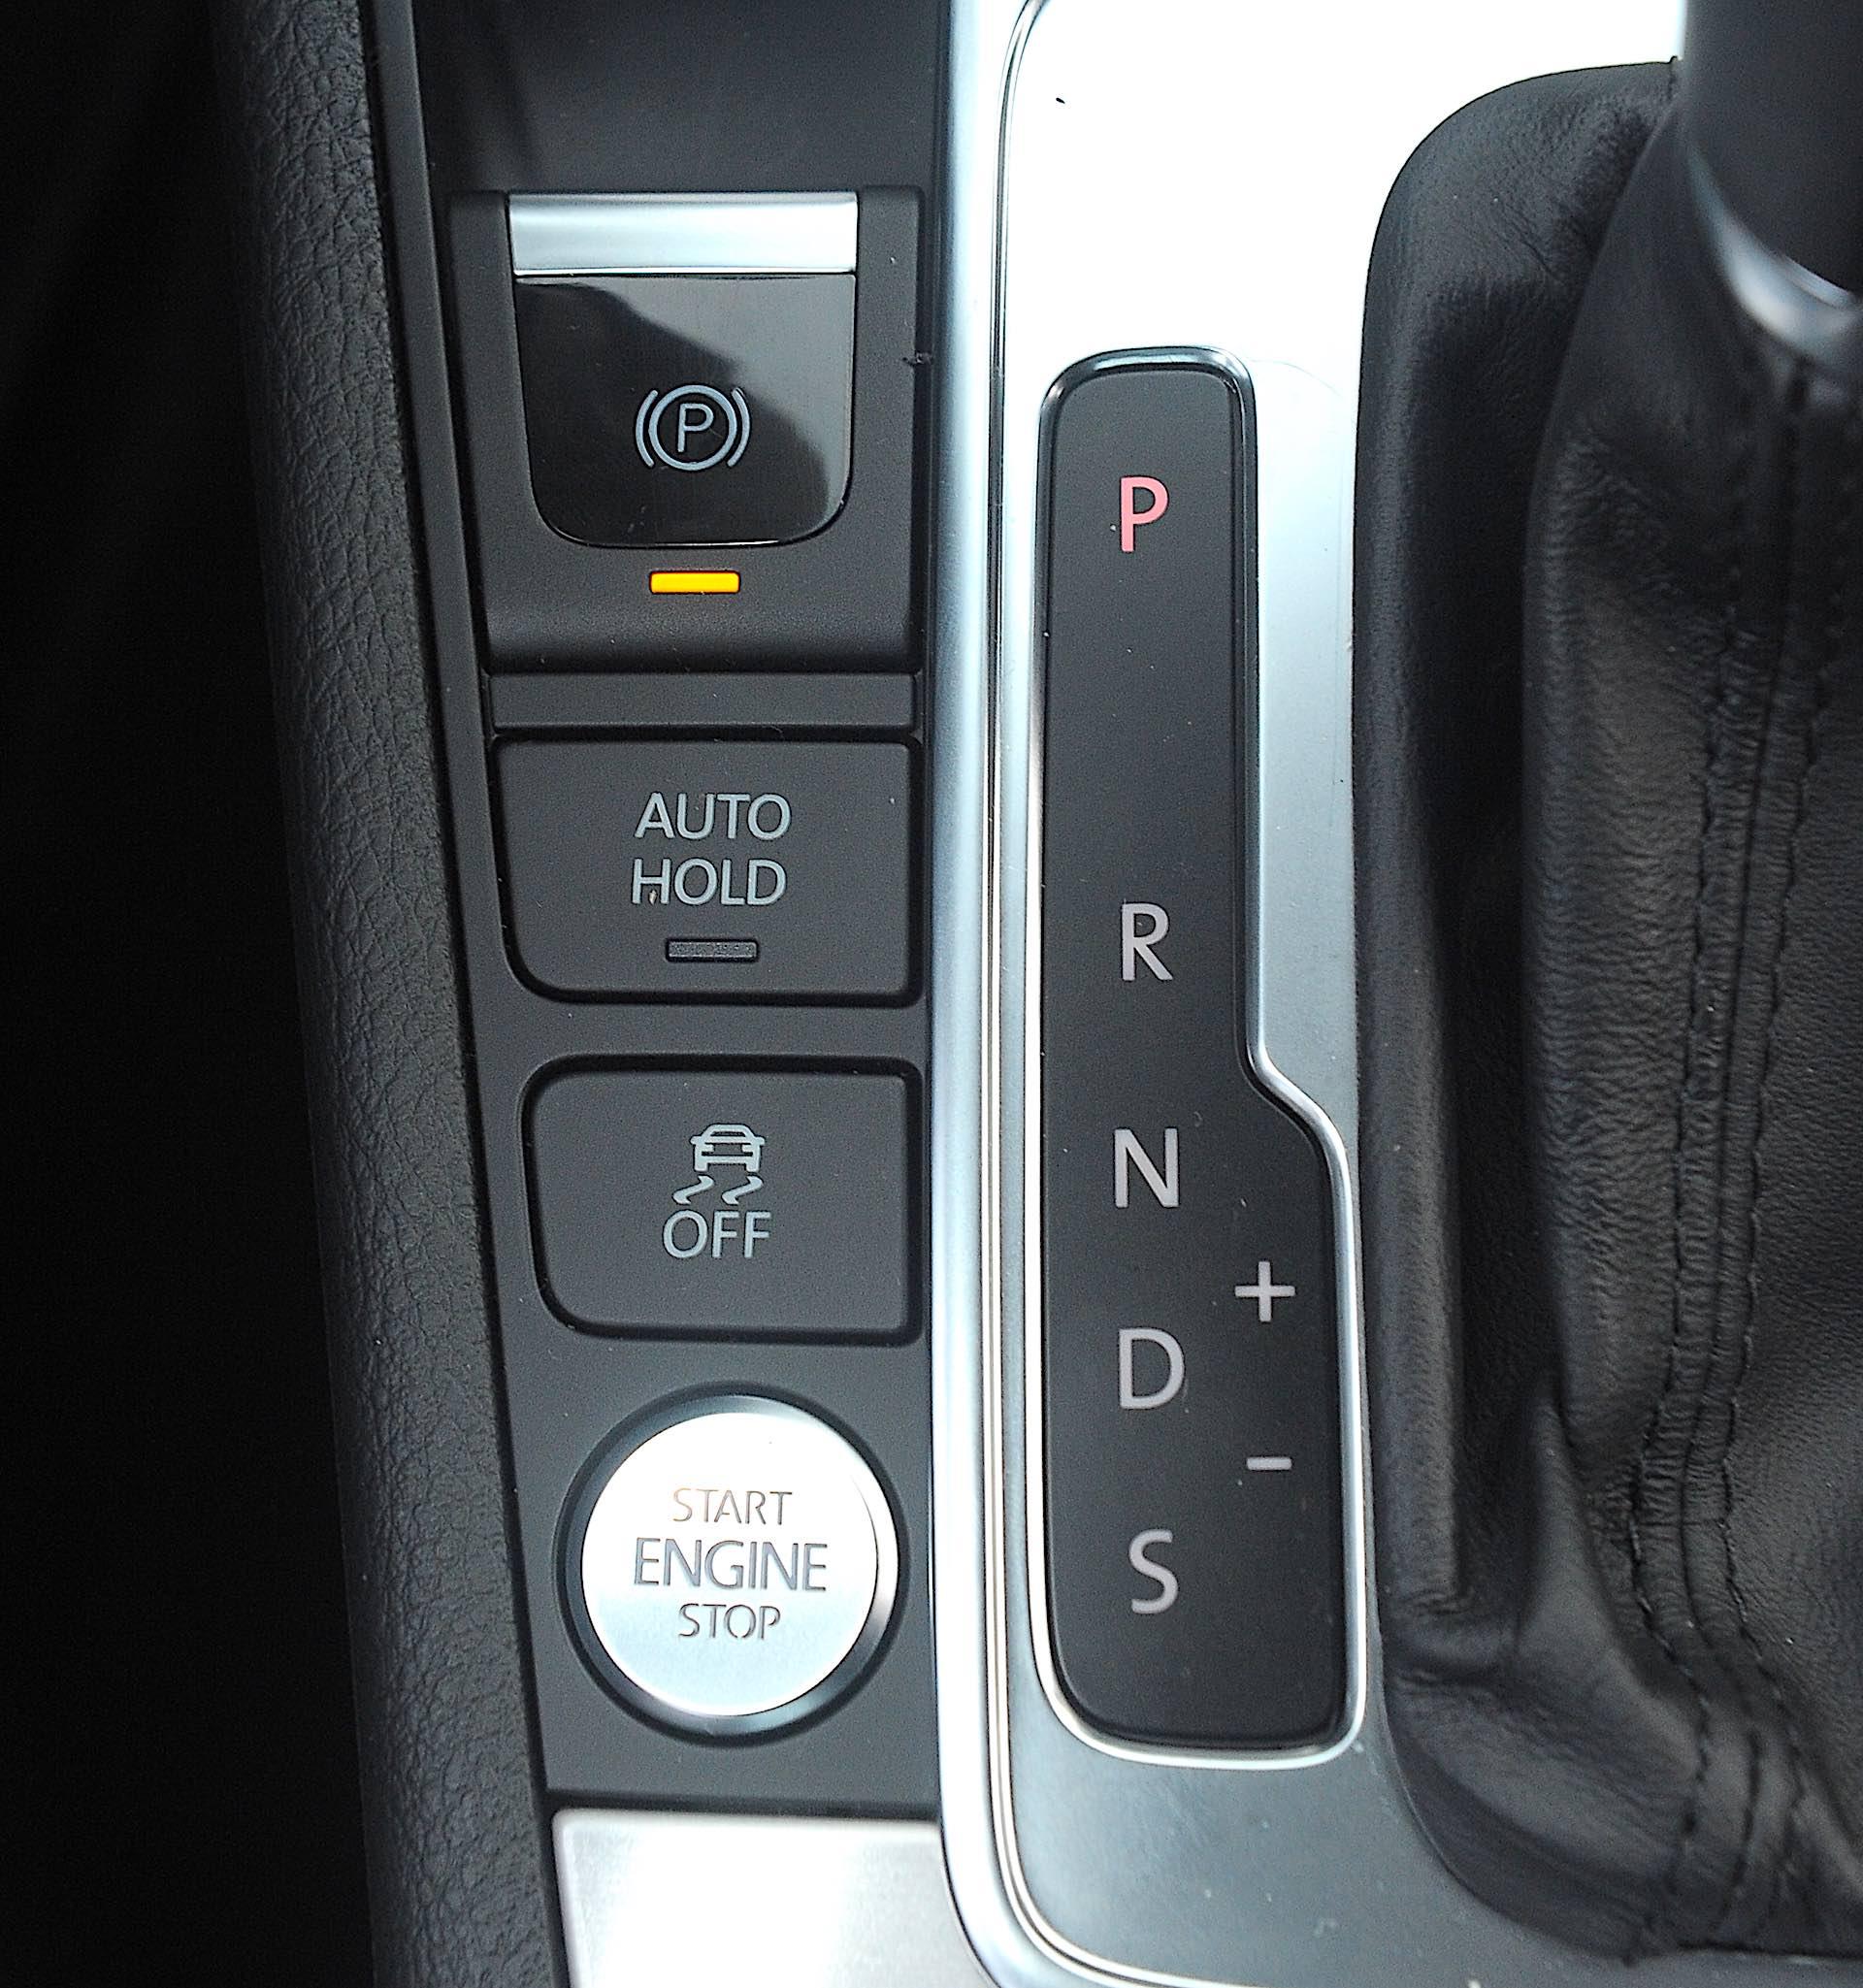 Volkswagen Passat B7 - auto hold